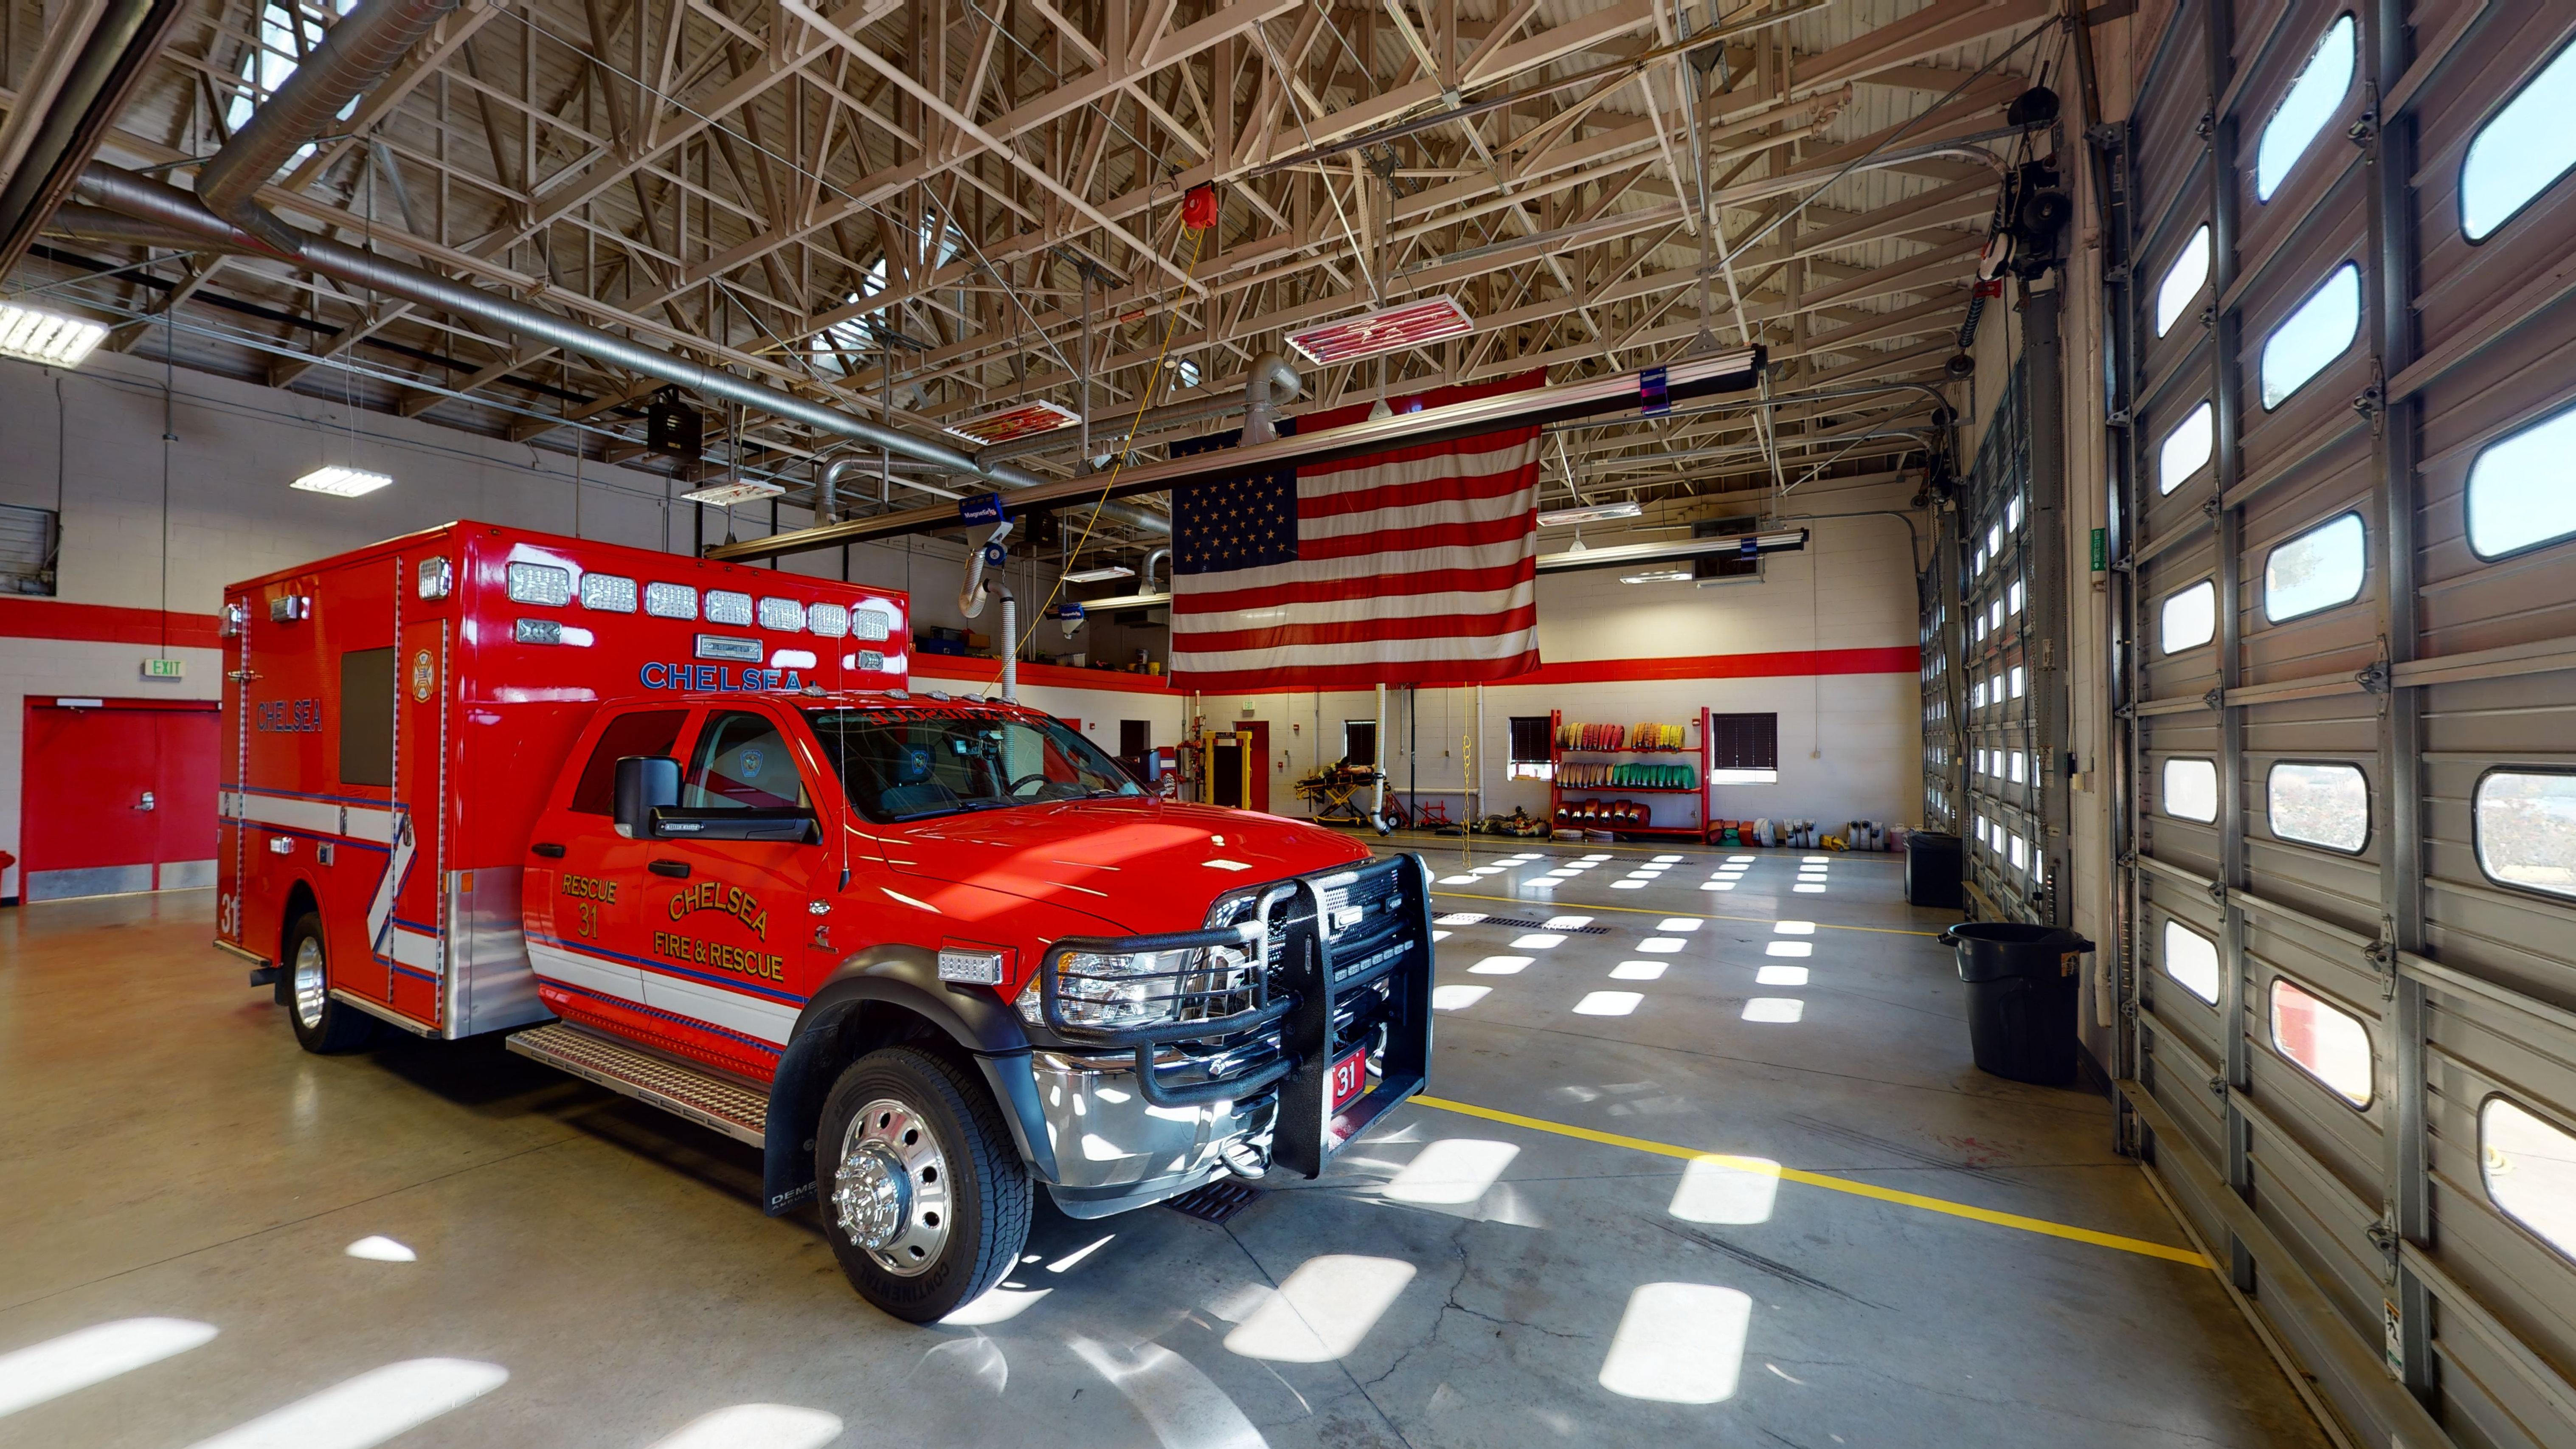 2_Chelsea-Fire-Rescue-Demers-151-06162021_101039